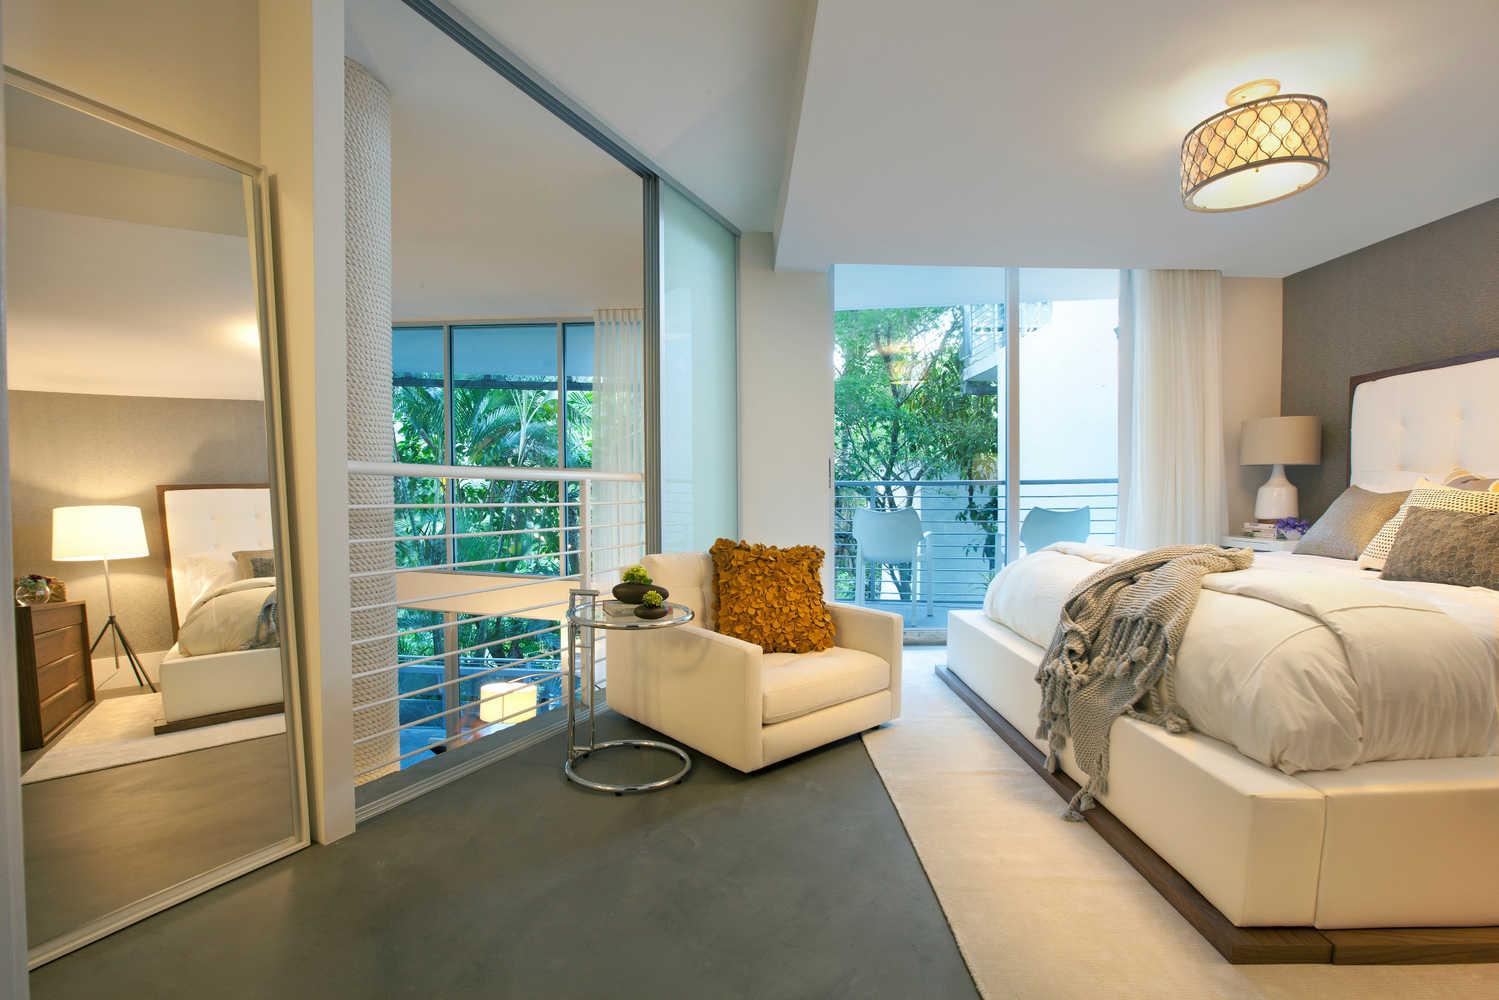 Master Bedroom Ideas - DKOR Interior Design Portfolio